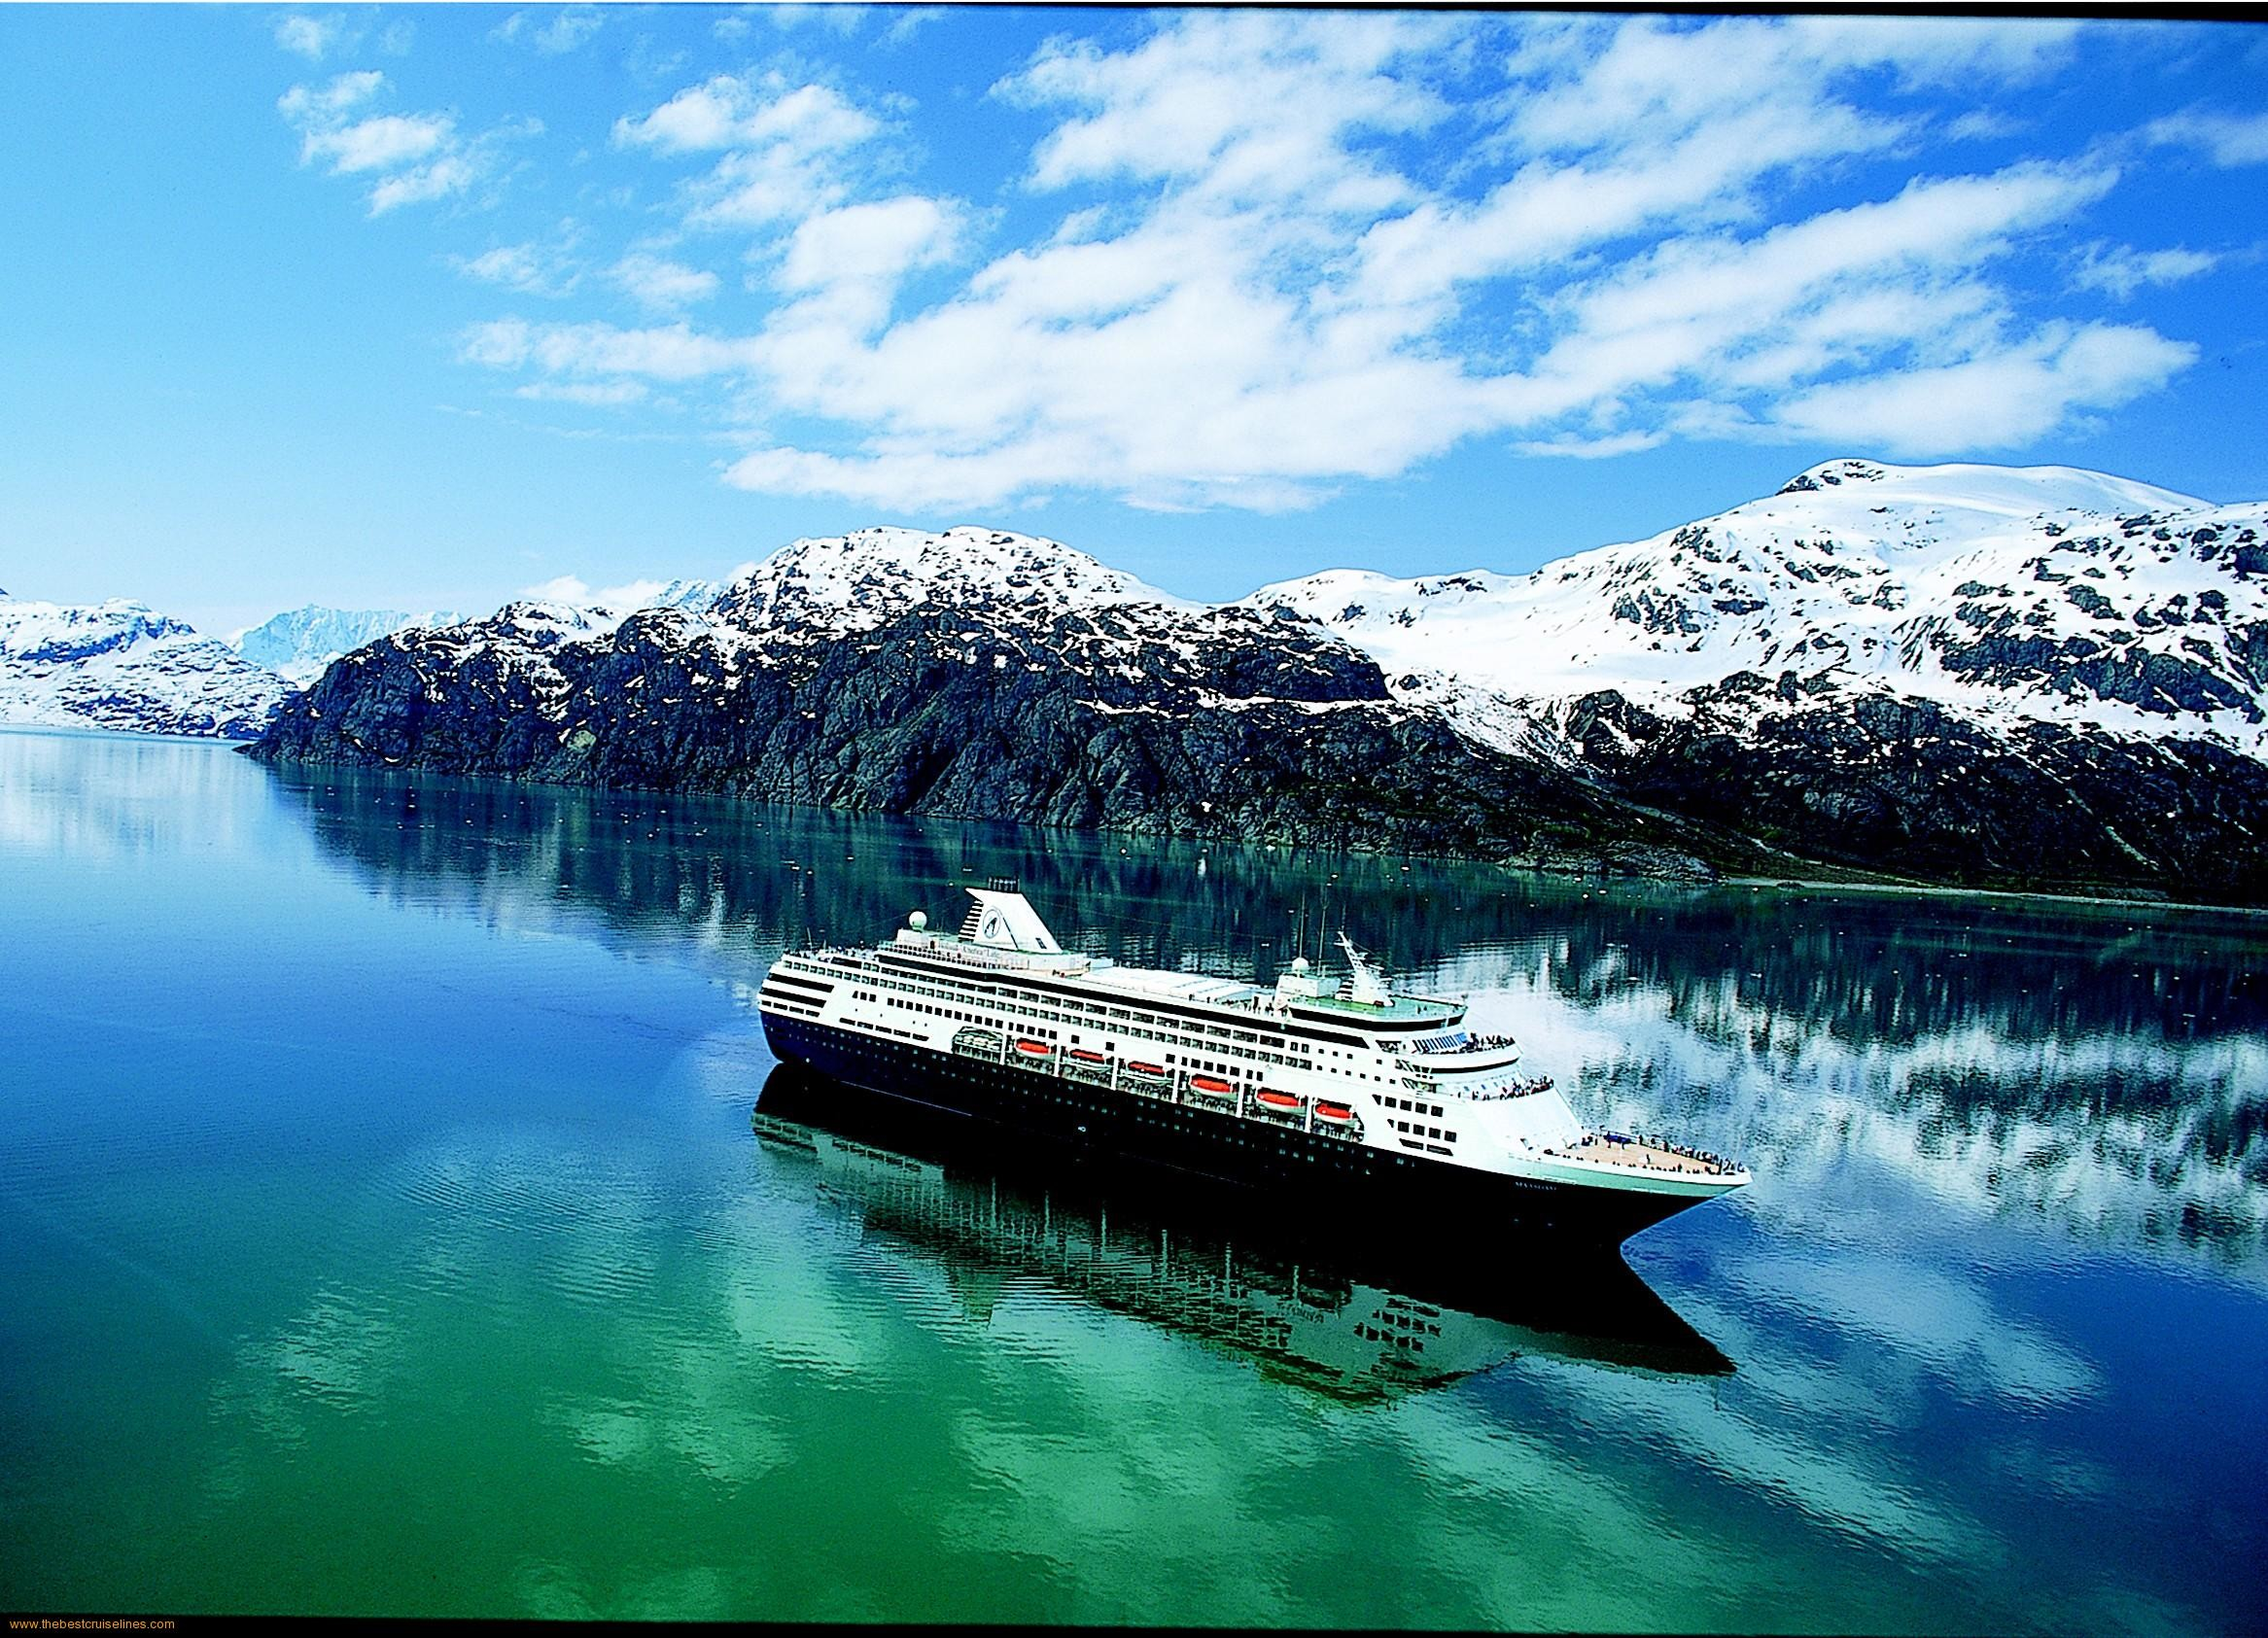 Alaska Wallpaper Screensaver 56 Images